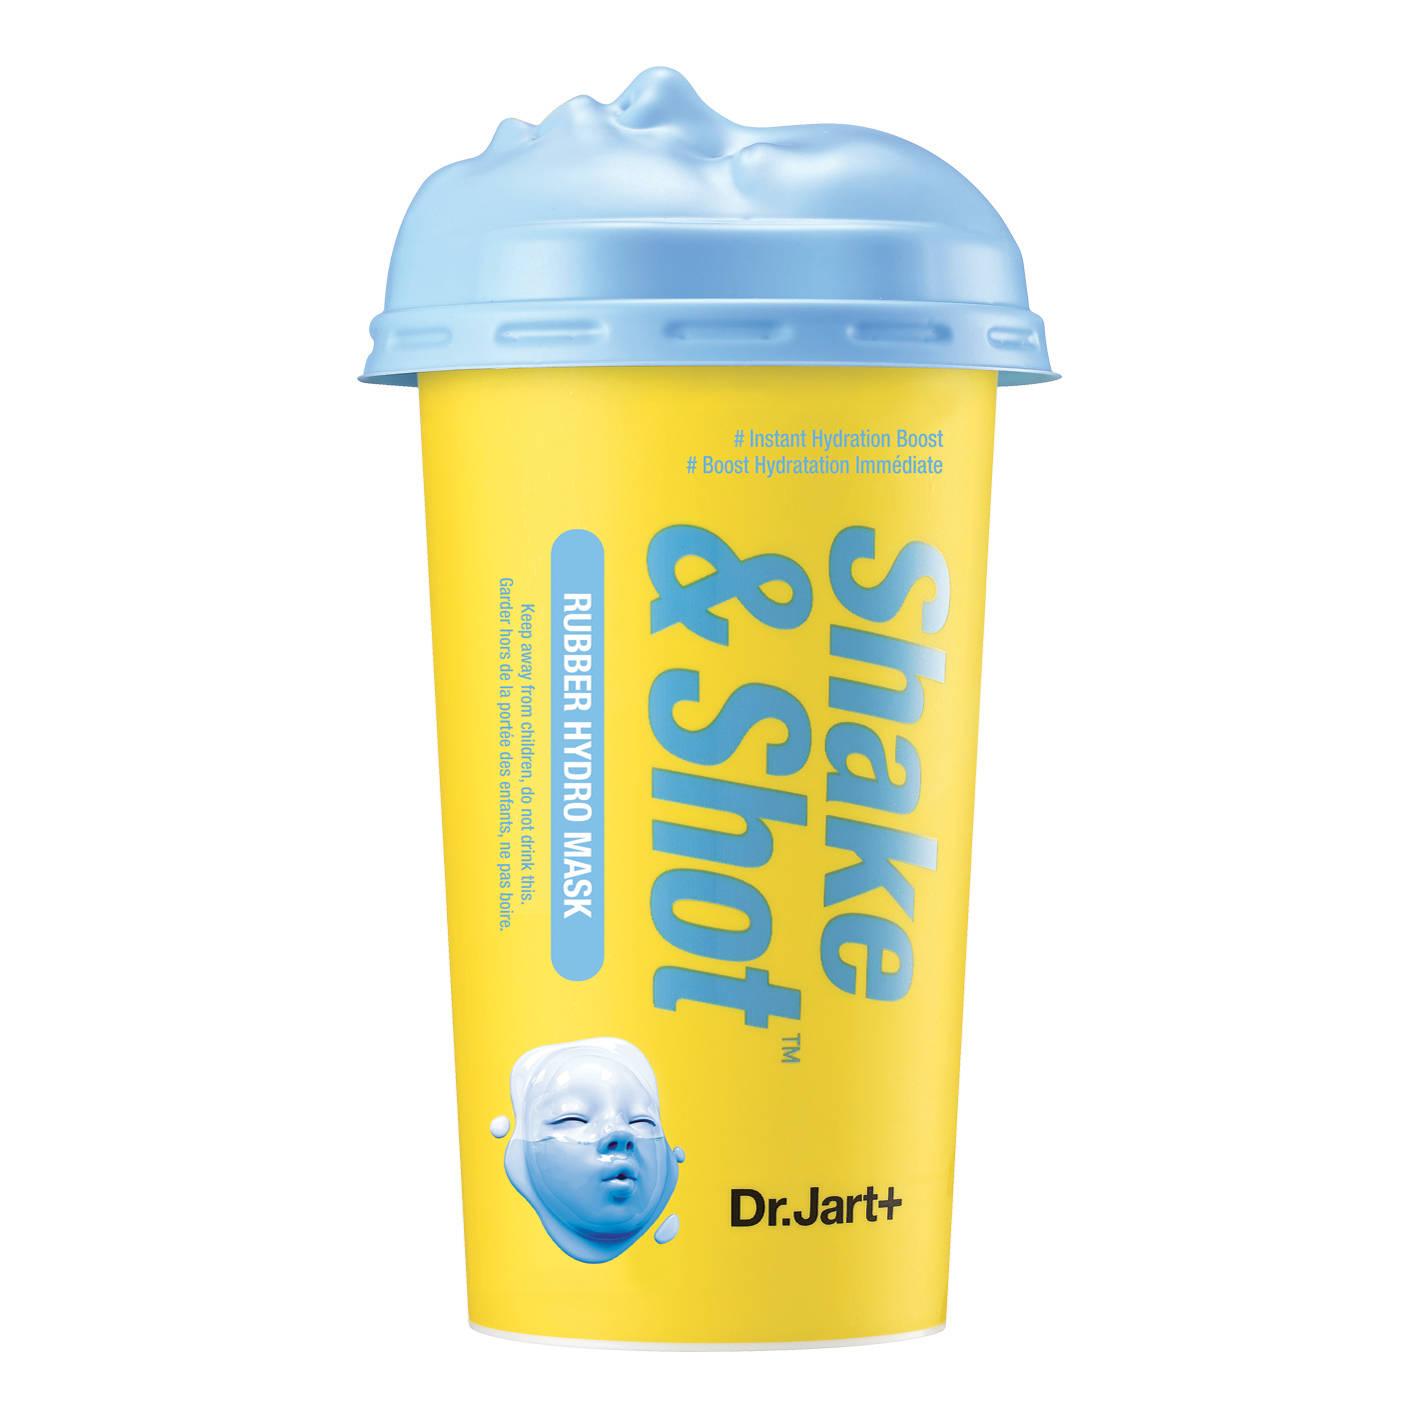 RubberMask Mascarilla Shake & Shot hidratante